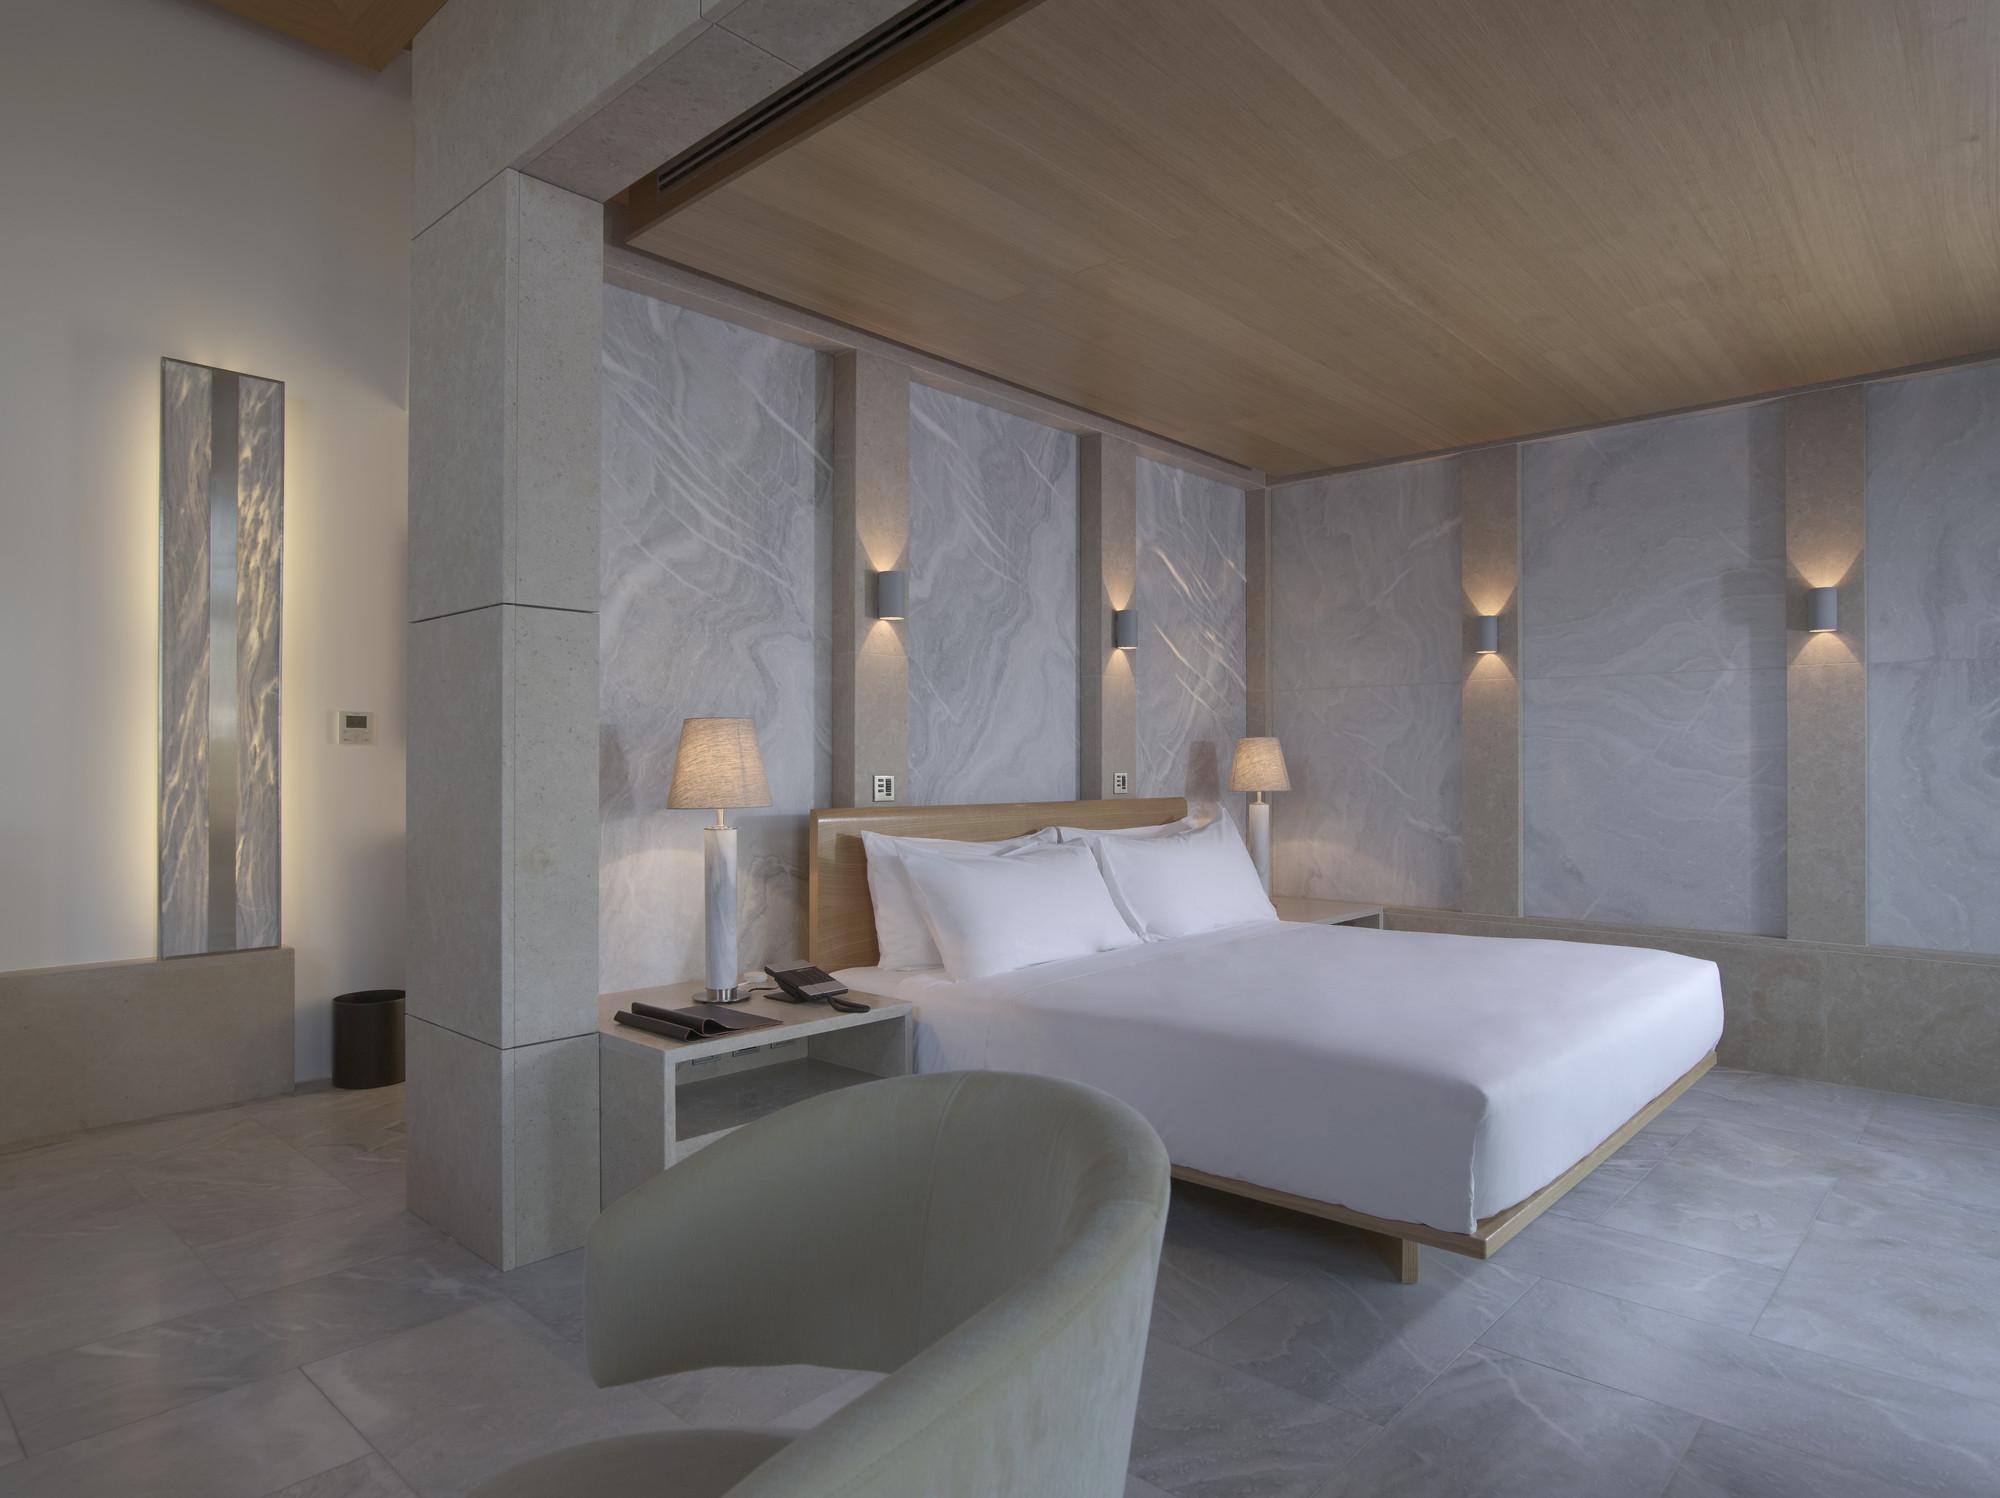 RS588_Amanzoe-Pavillion-Bedroom-lpr